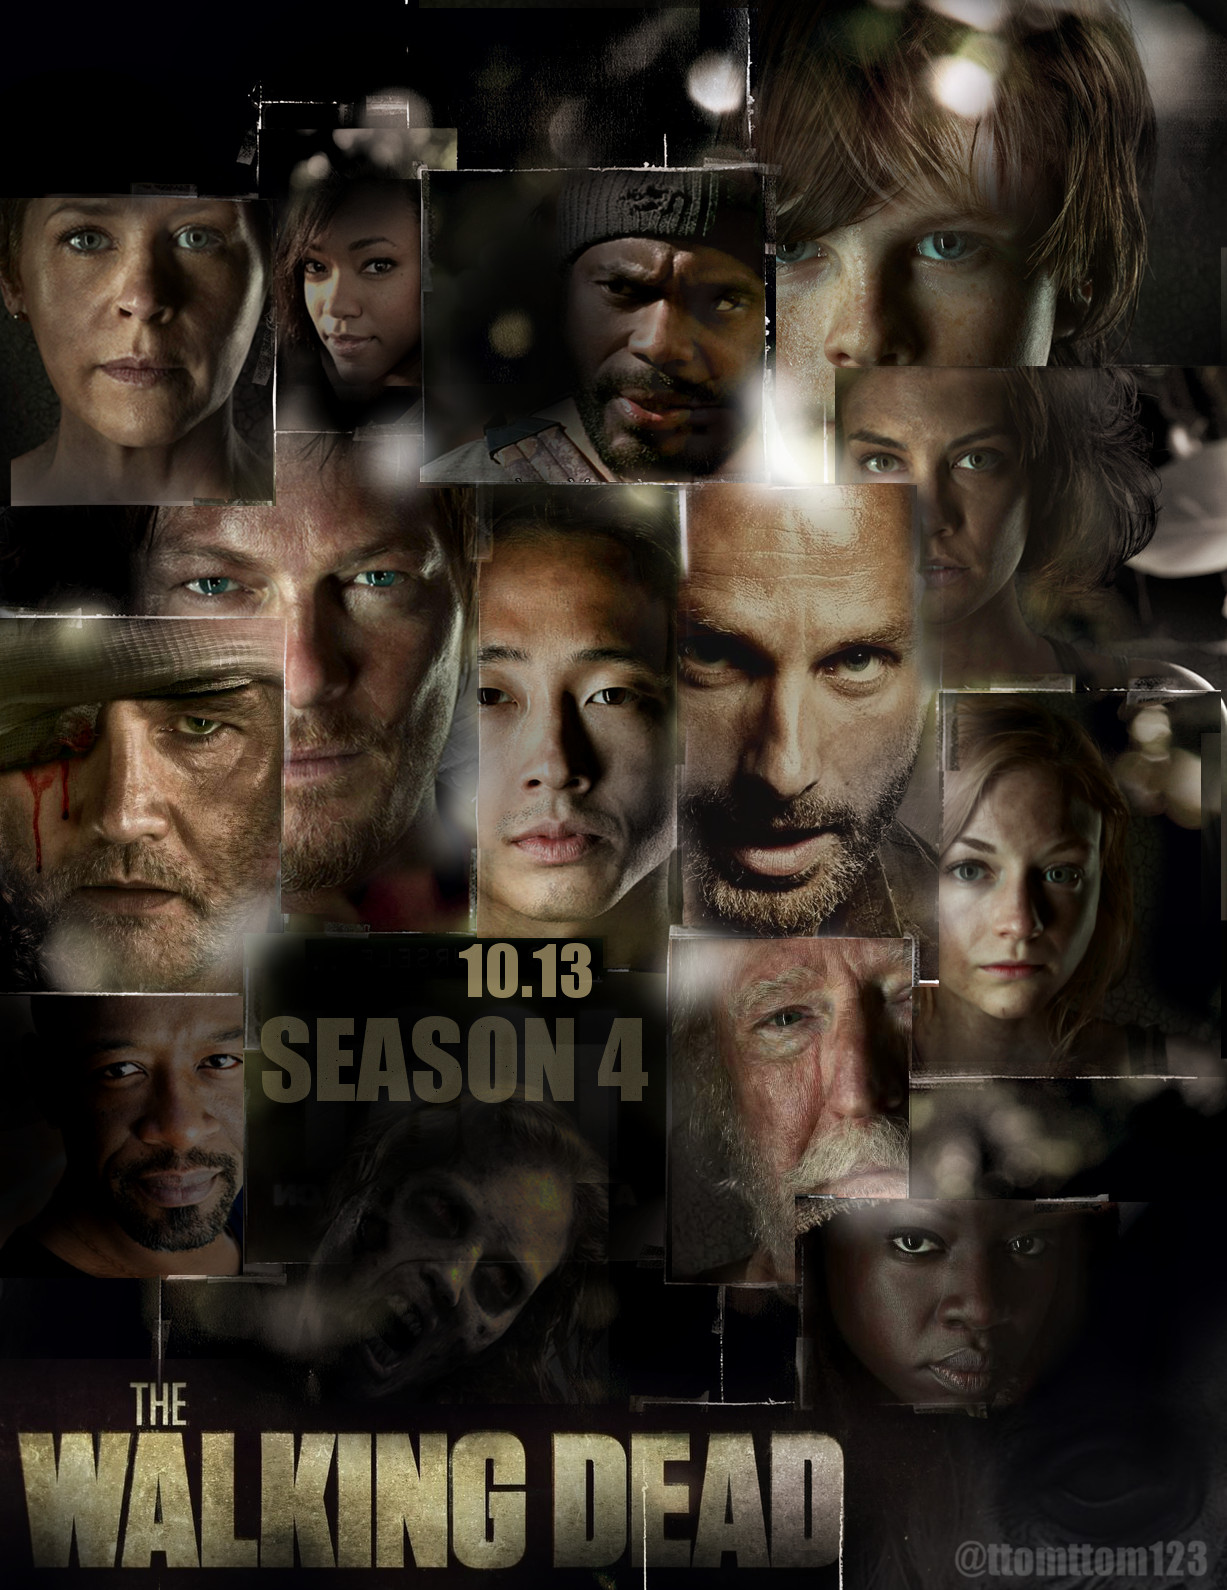 xem phim Xác Sống 4 2013 - The Walking Dead Season 4 full hd vietsub online poster